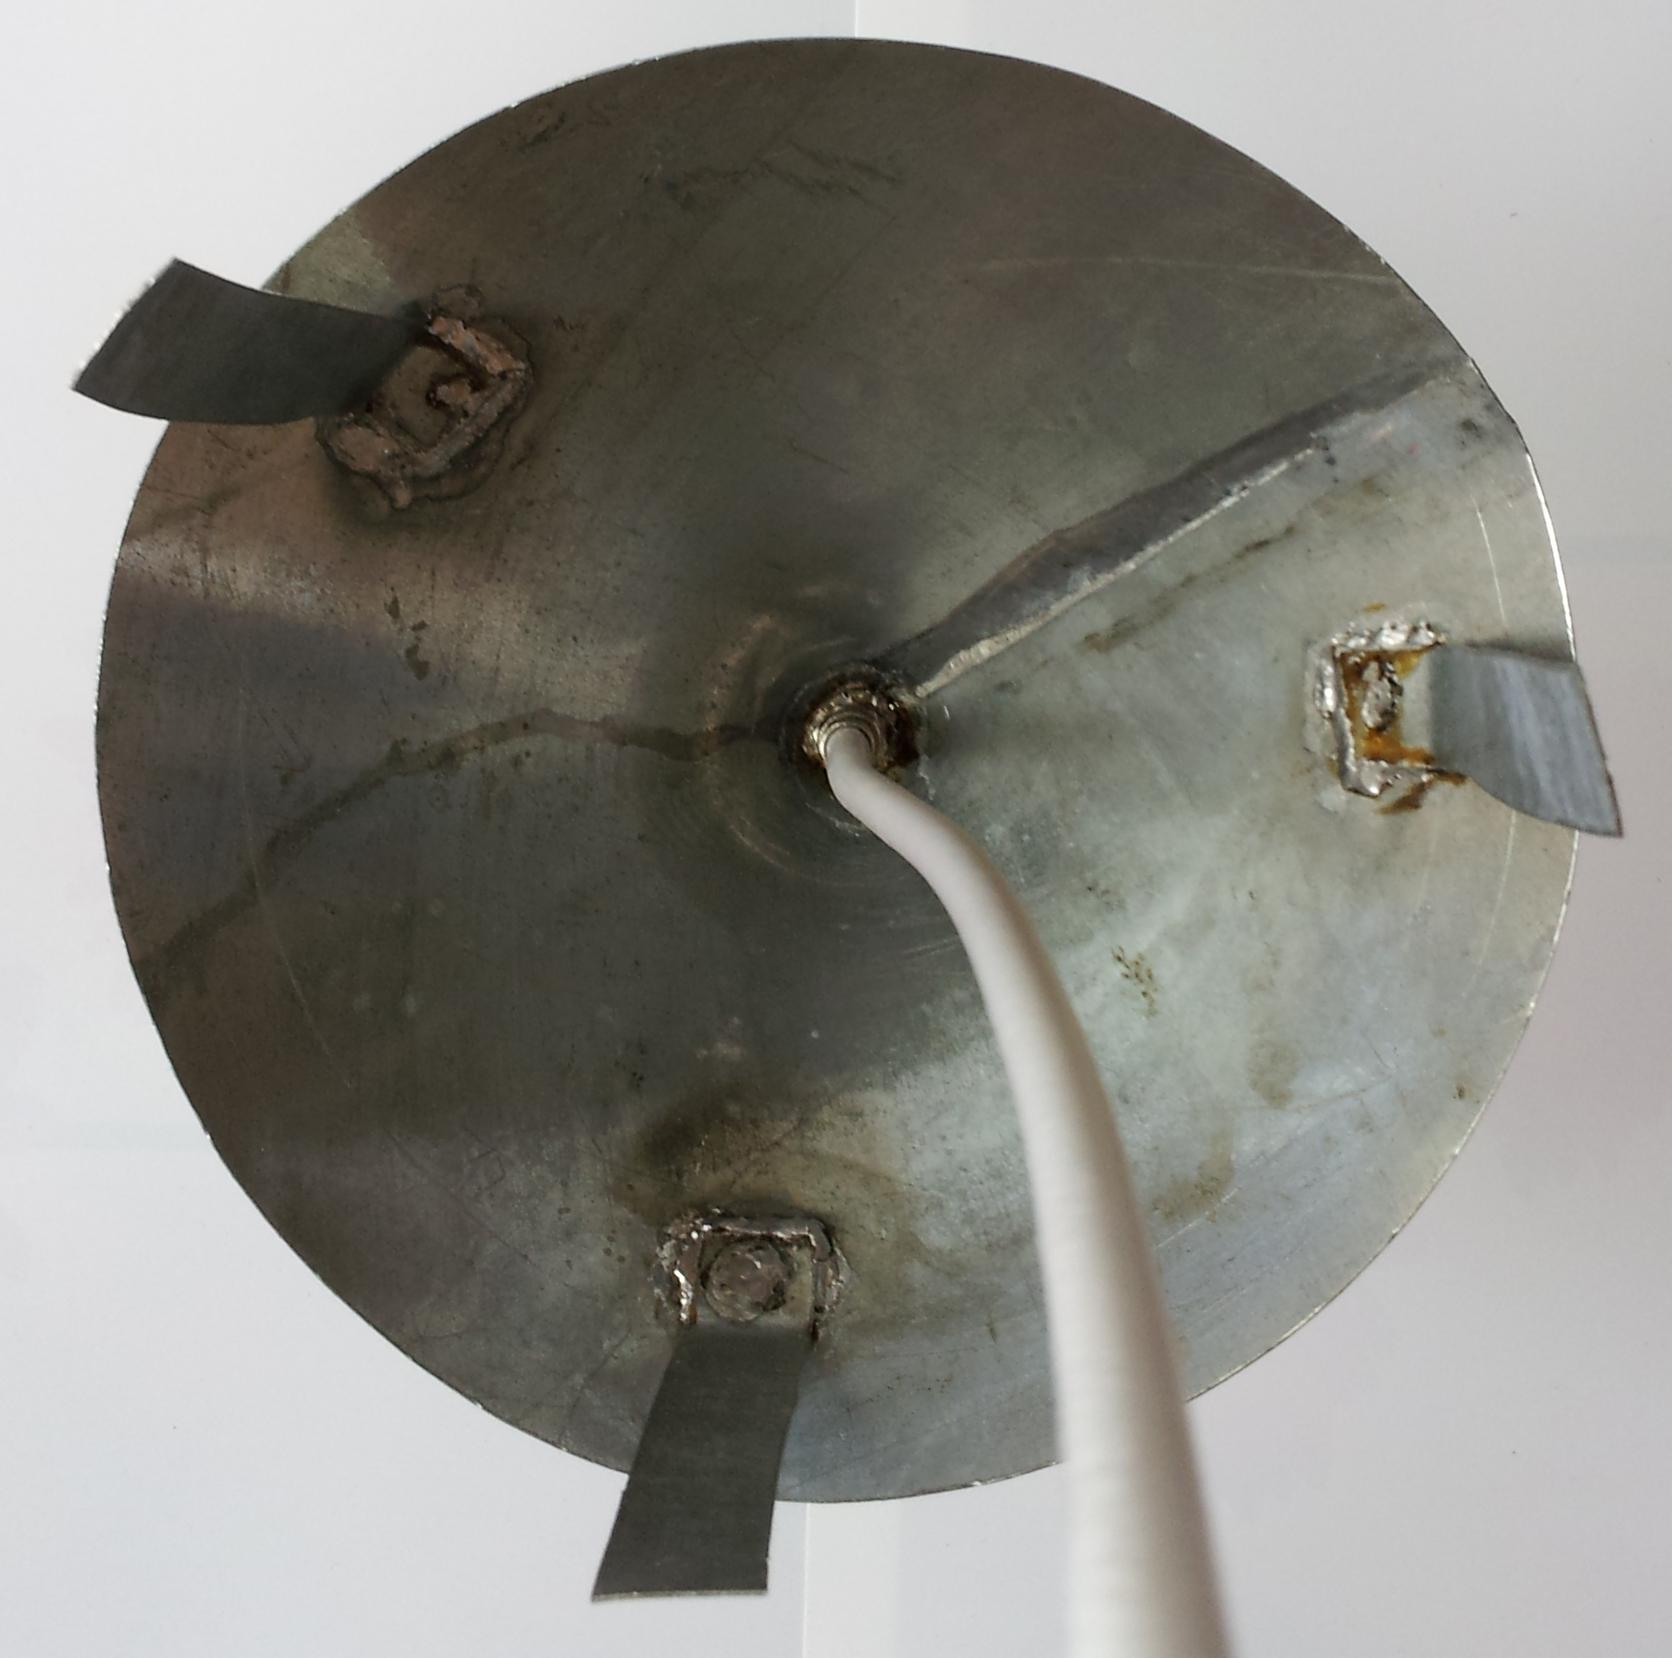 Groundplane-Antenne auf Dachlüfterhaube - Mikrocontroller.net